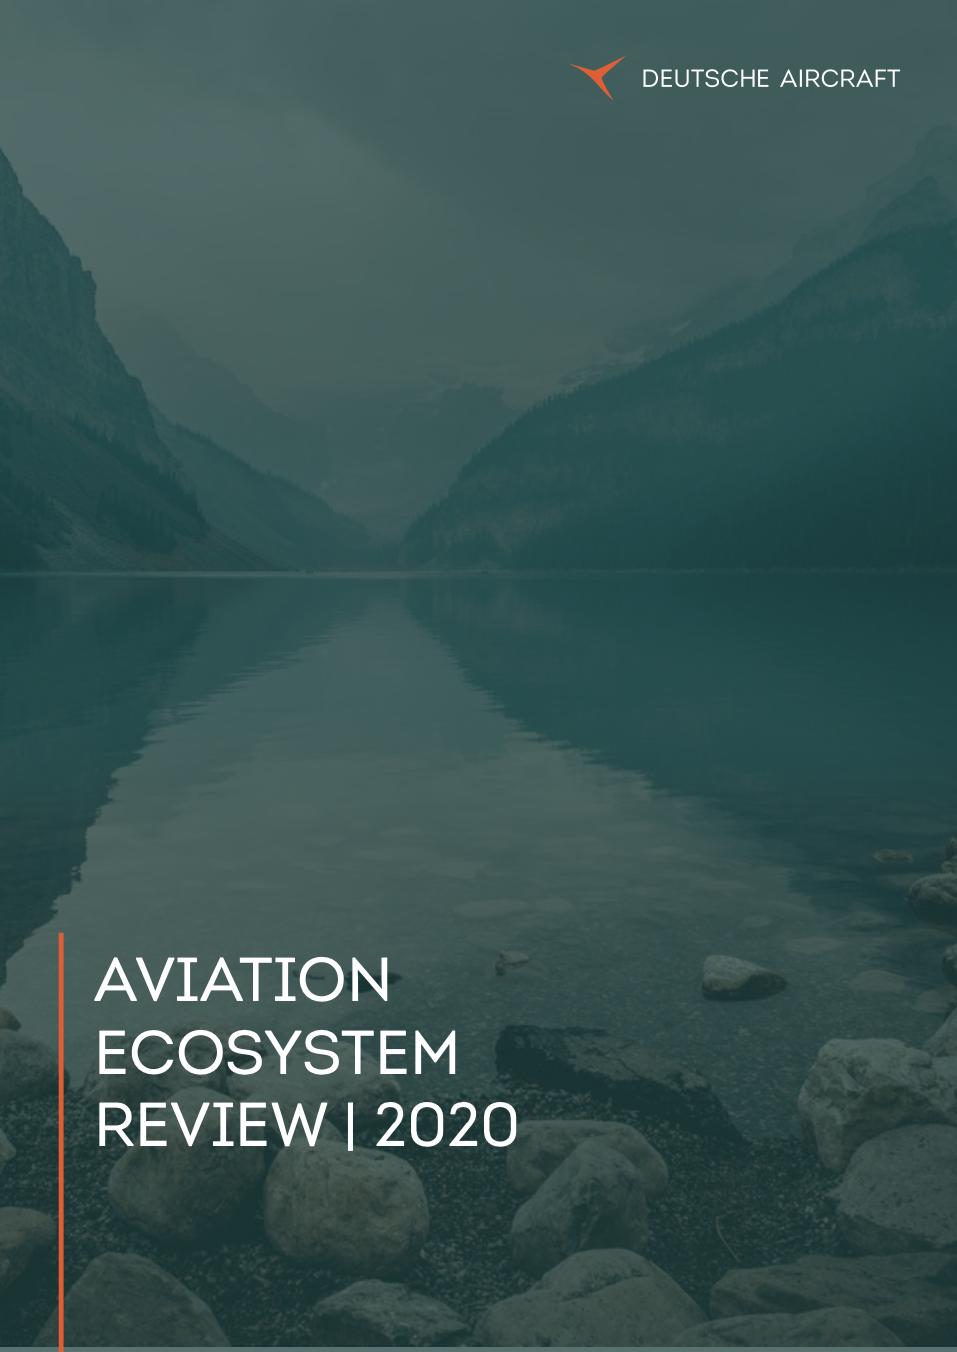 Deutsche Aircraft Aviation Ecosystem Review 2020 Download